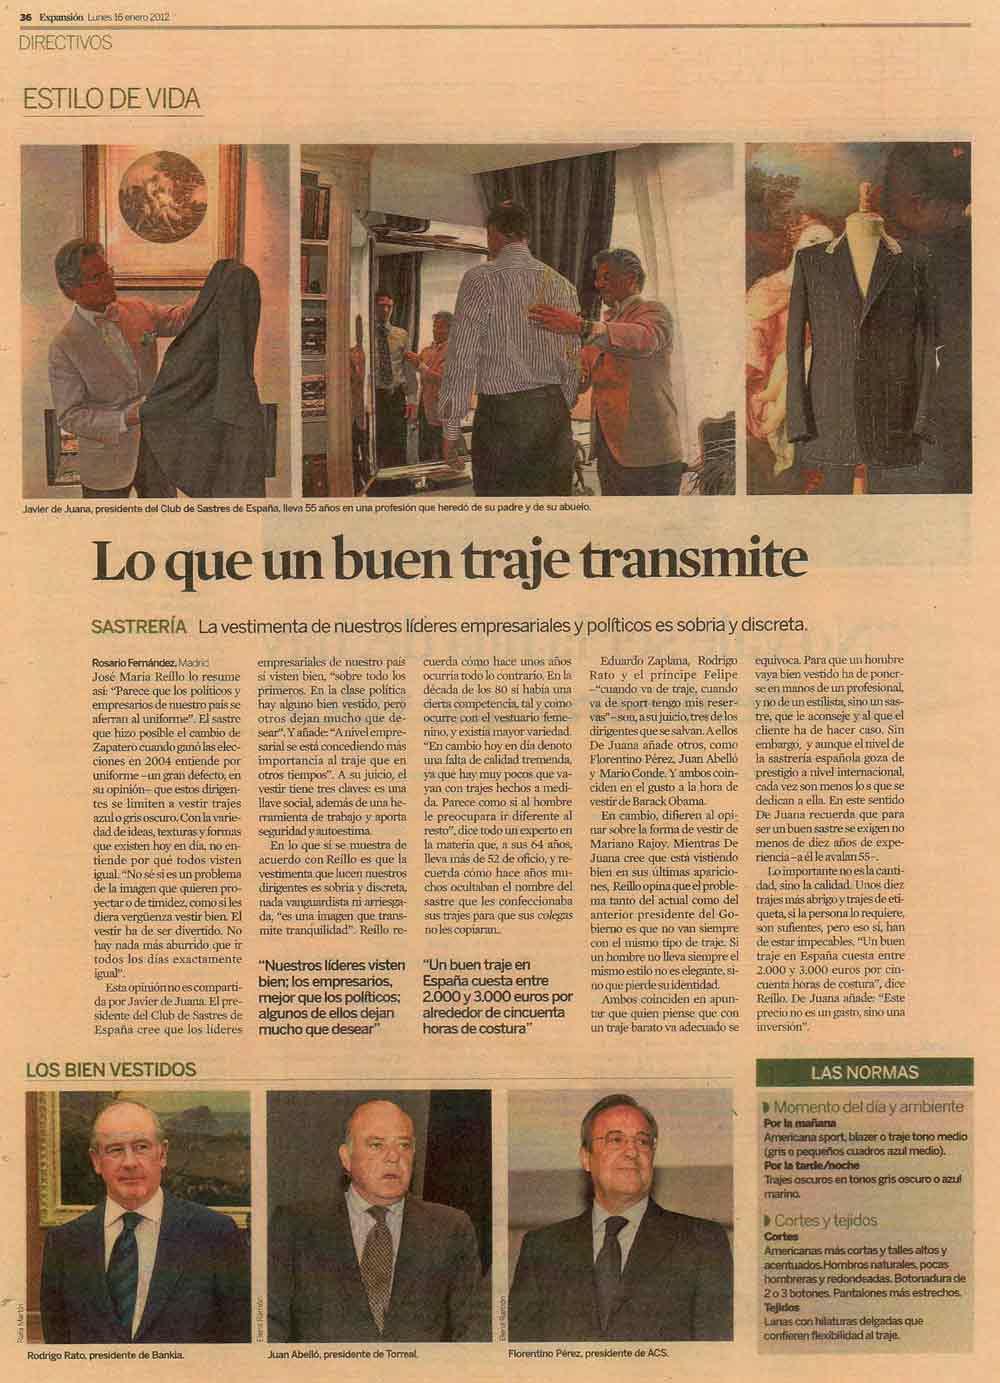 Reportaje Expansión - Javier de Juana